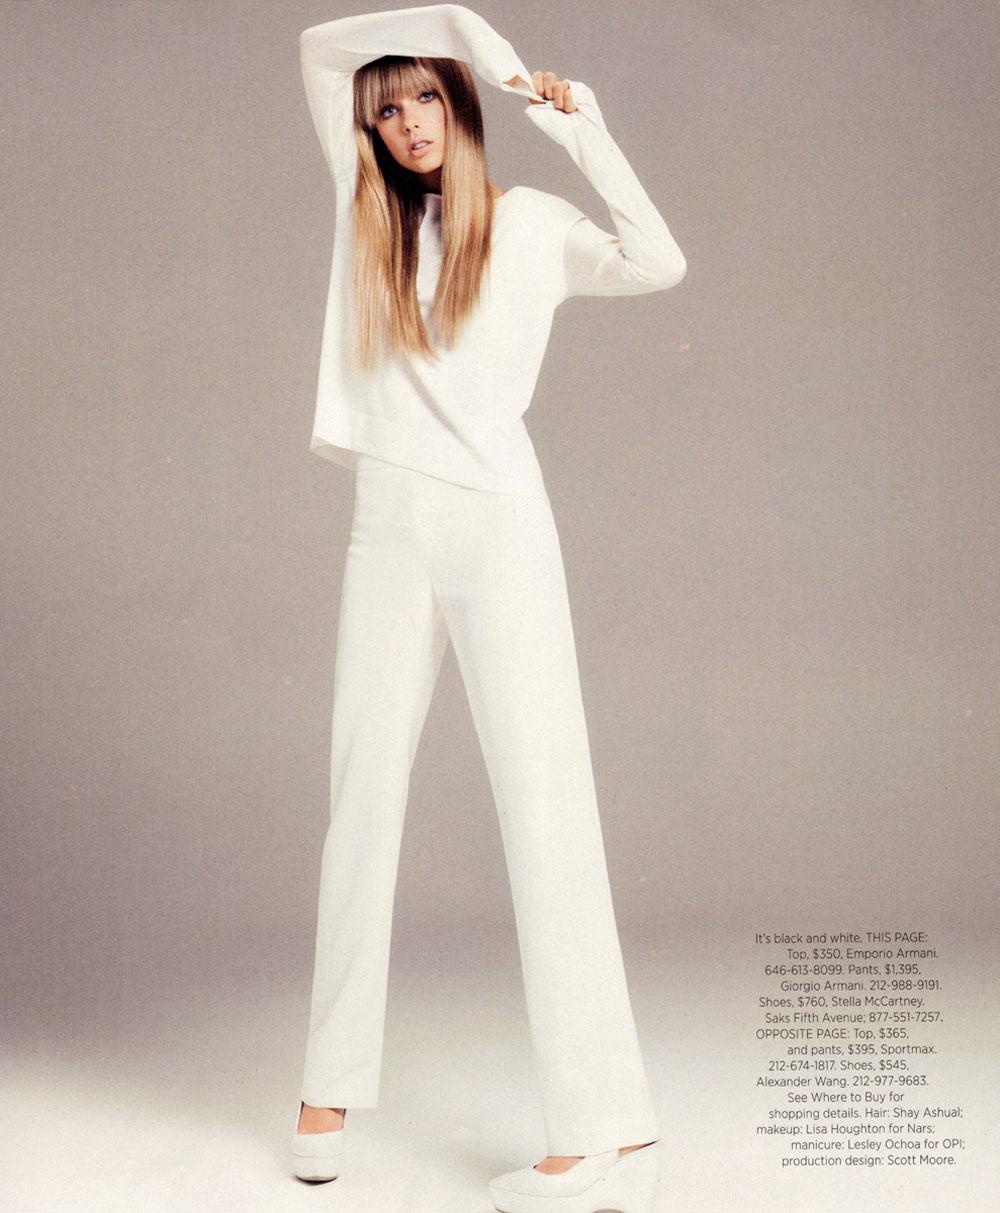 Taylor Swift Harpers Bazaar Magazine December 2012 January2013 Issue